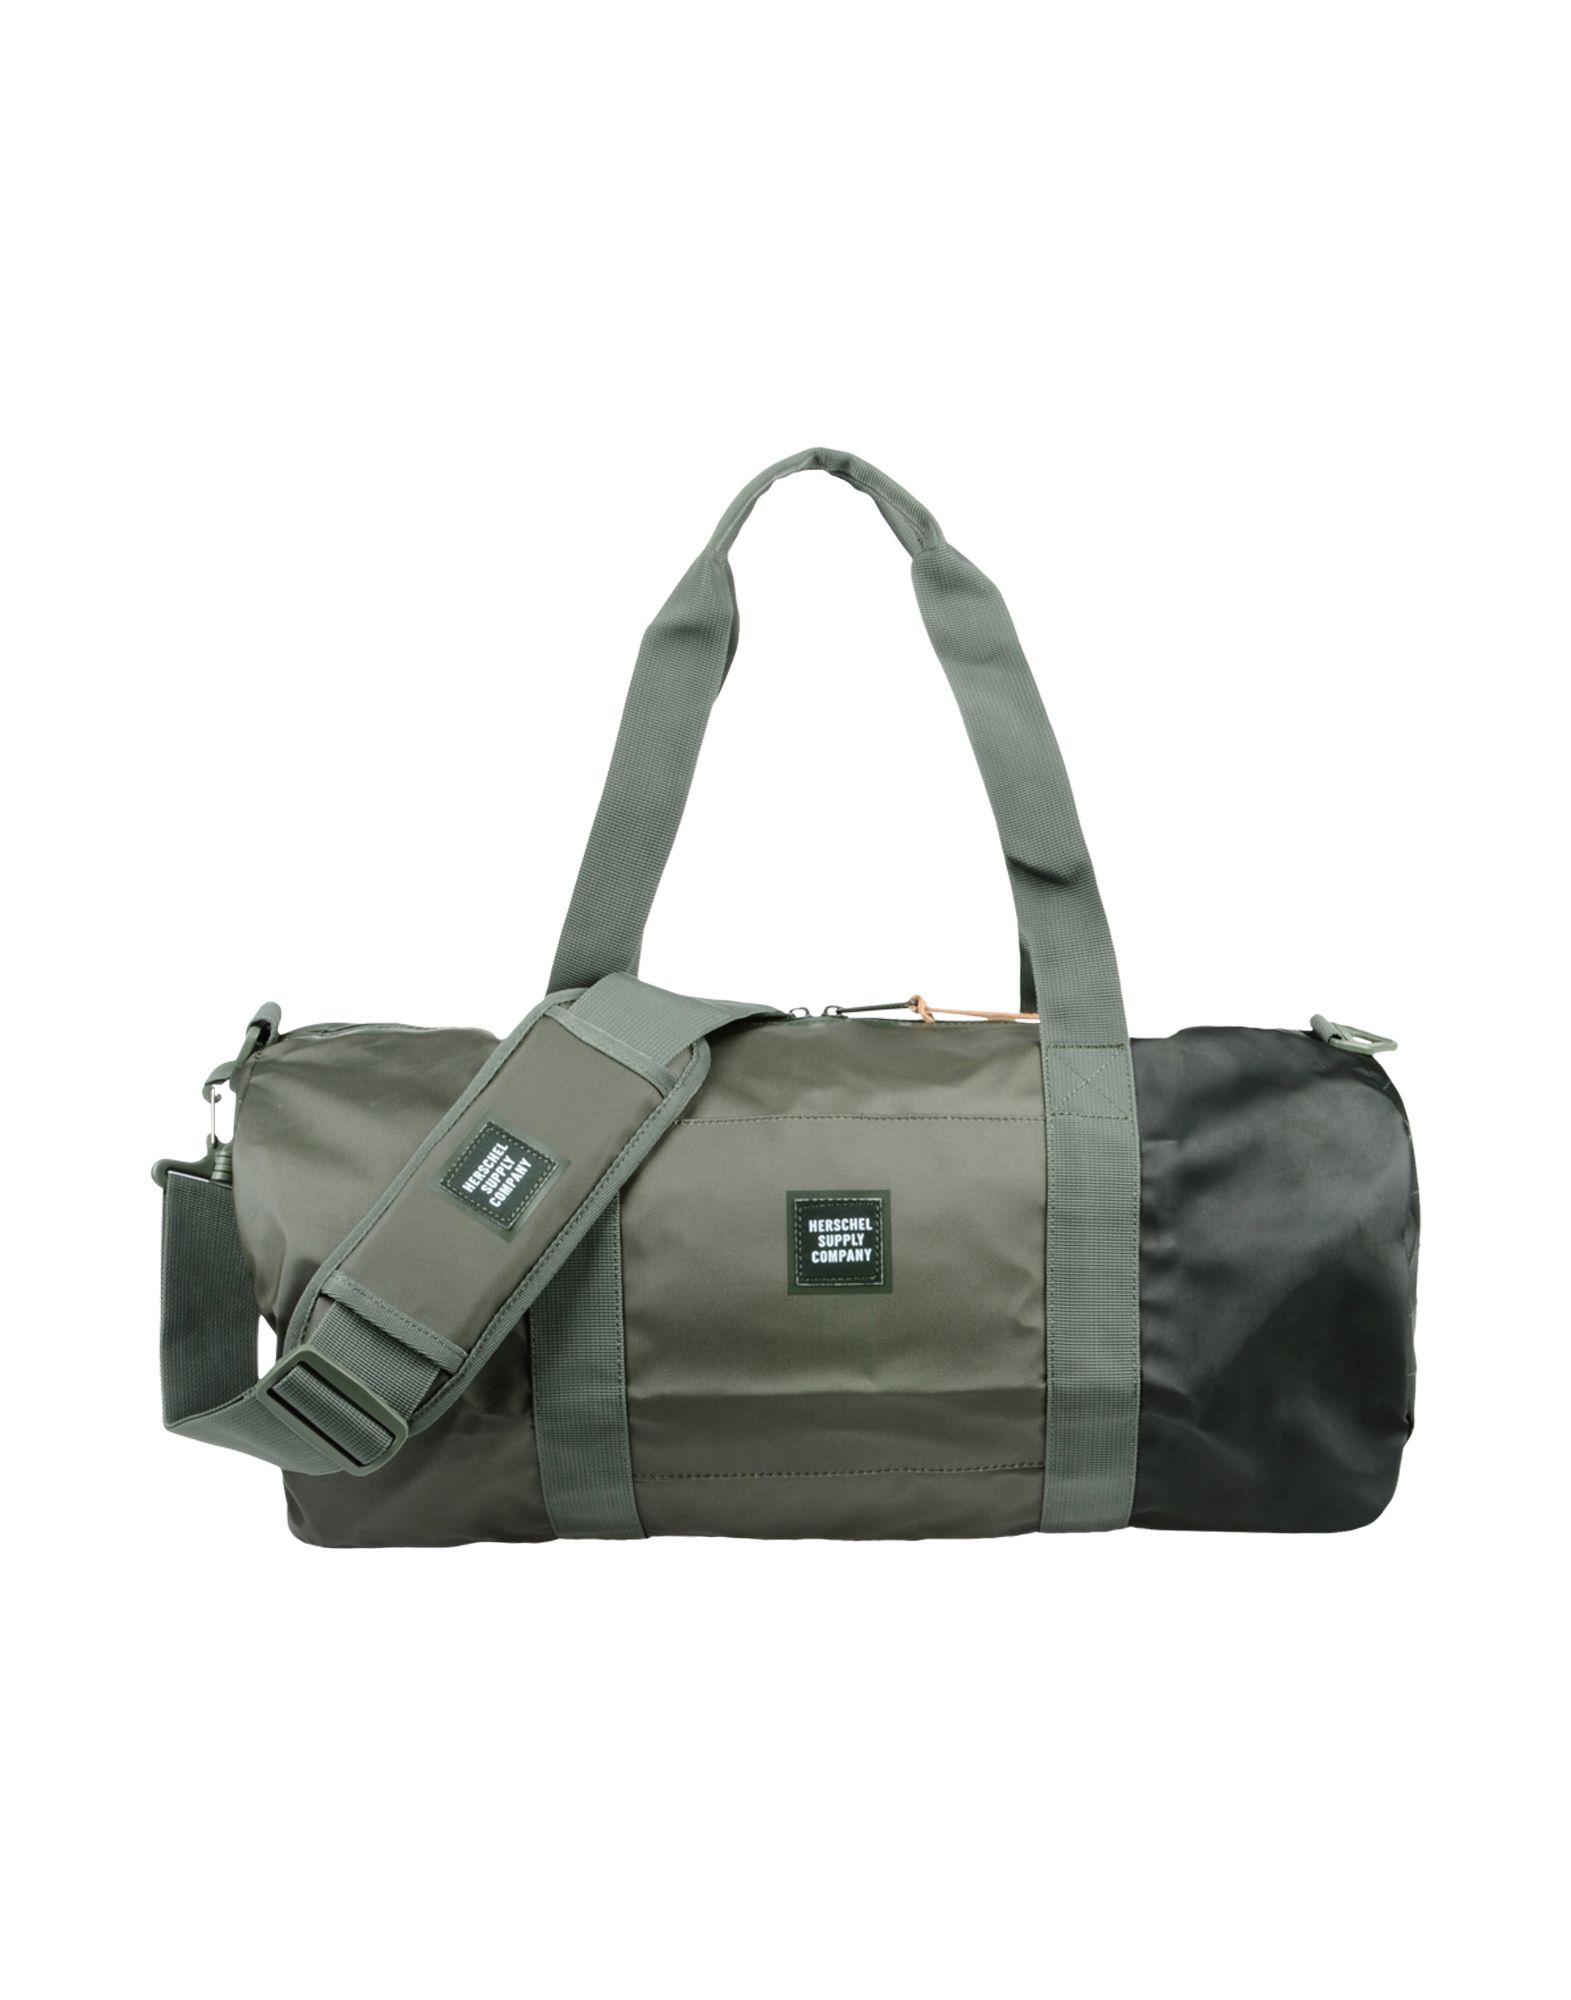 421347517bf5 Herschel Supply Co. Sutton Mid Duffle Studio - Travel   Duffel Bag ...